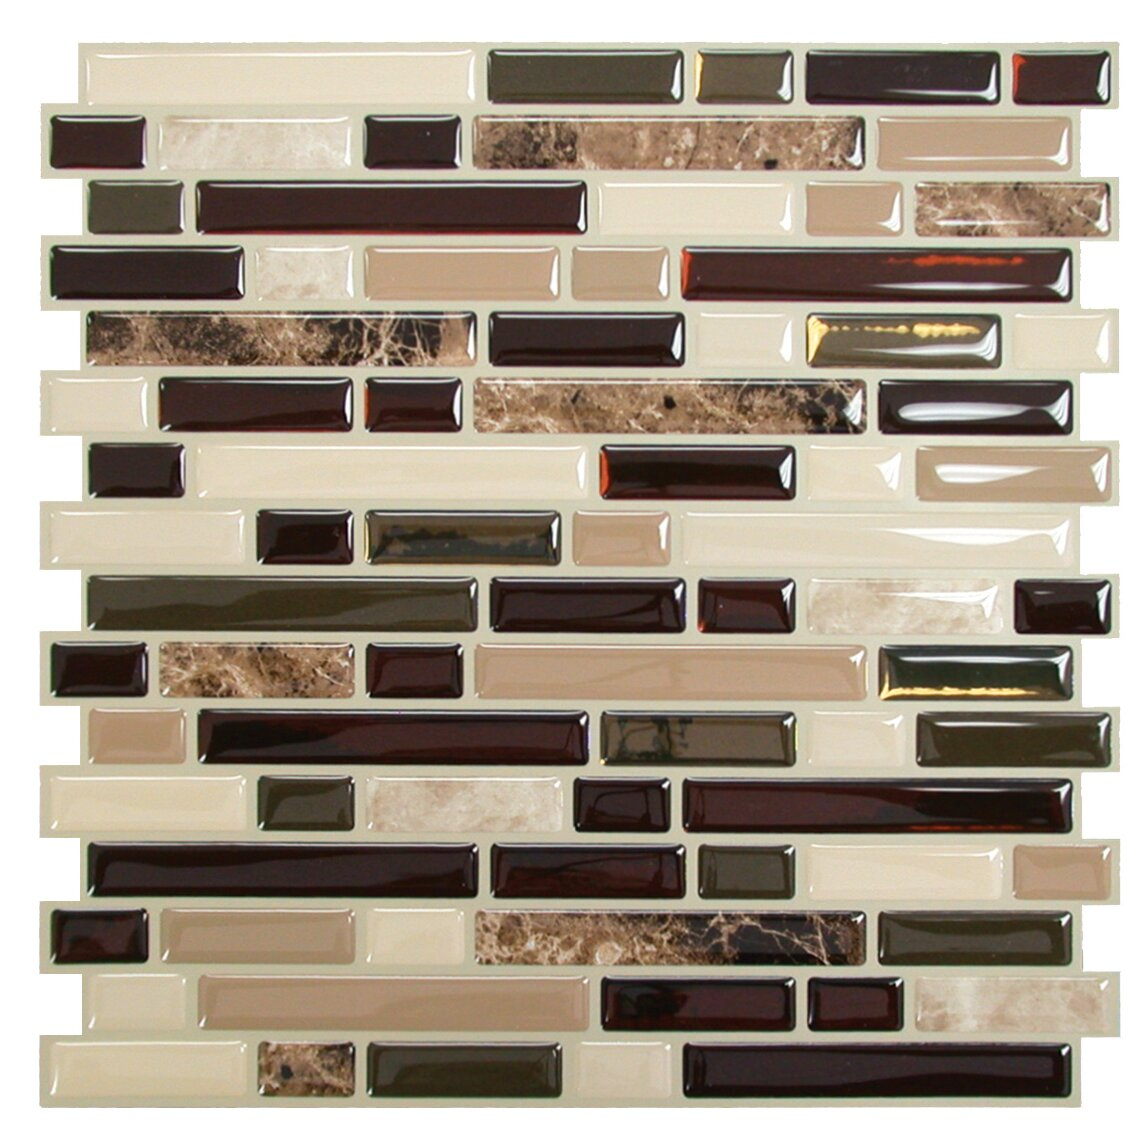 "Peel And Stick Flooring Accent 1 2 Wall: Smart Tiles Mosaik Bellagio Keystone 10.06"" X 10"" Peel"